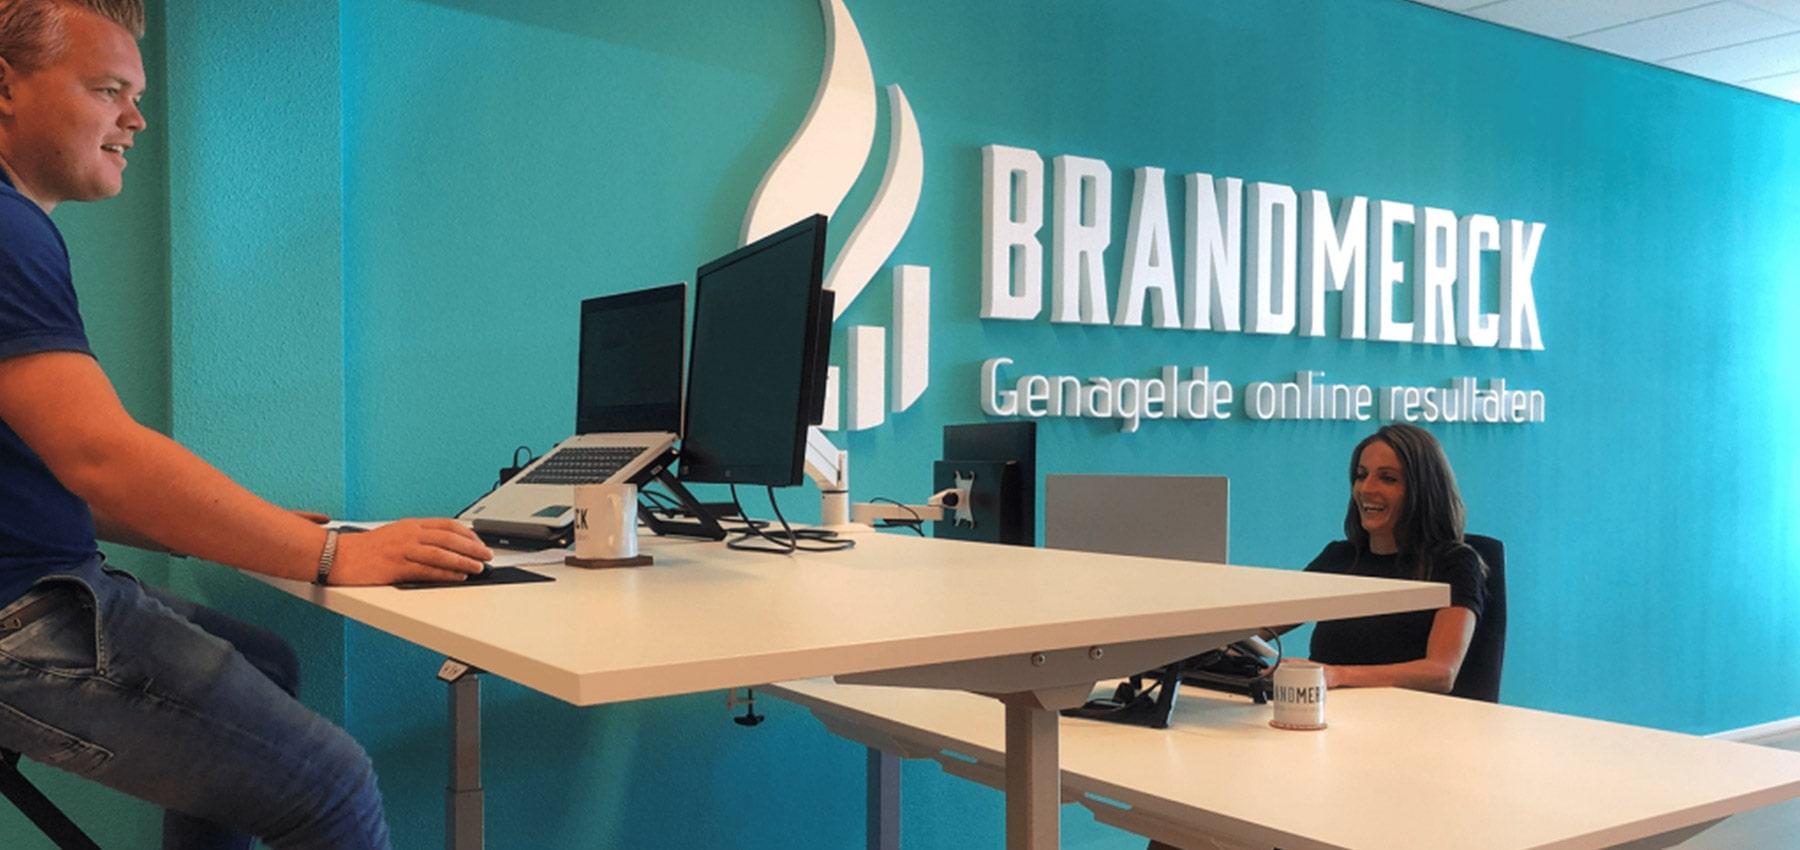 Samenwerking Goedkoopinrichten.nl Brandmerck